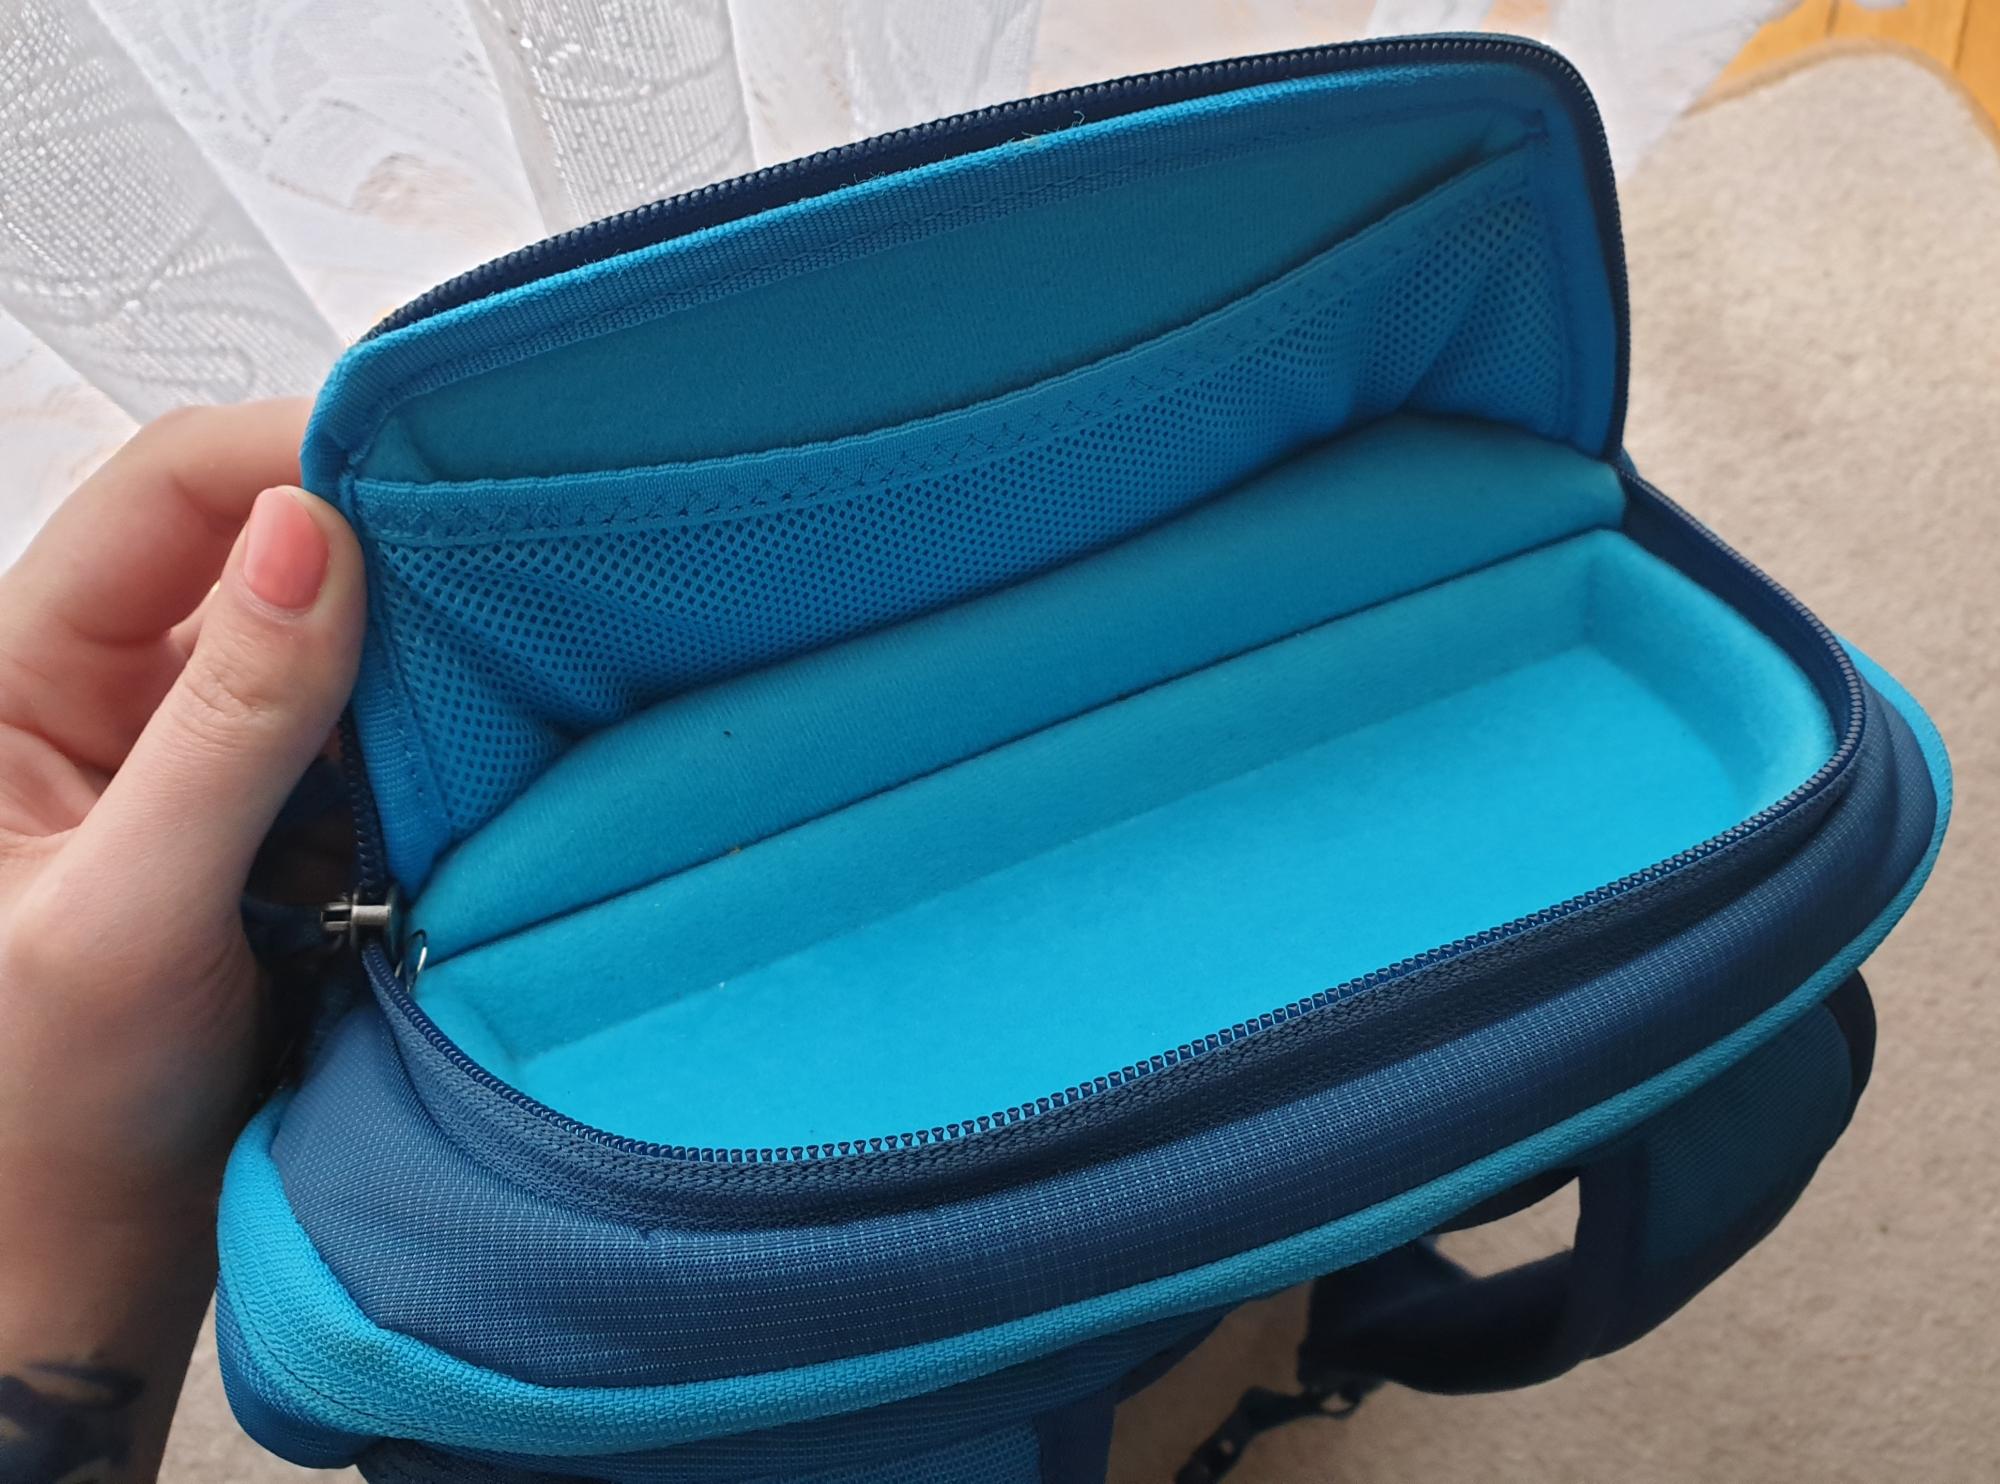 Thule EnRoute 23L - miejski plecak, który teraz kupisz o 57% taniej (opinia) 29